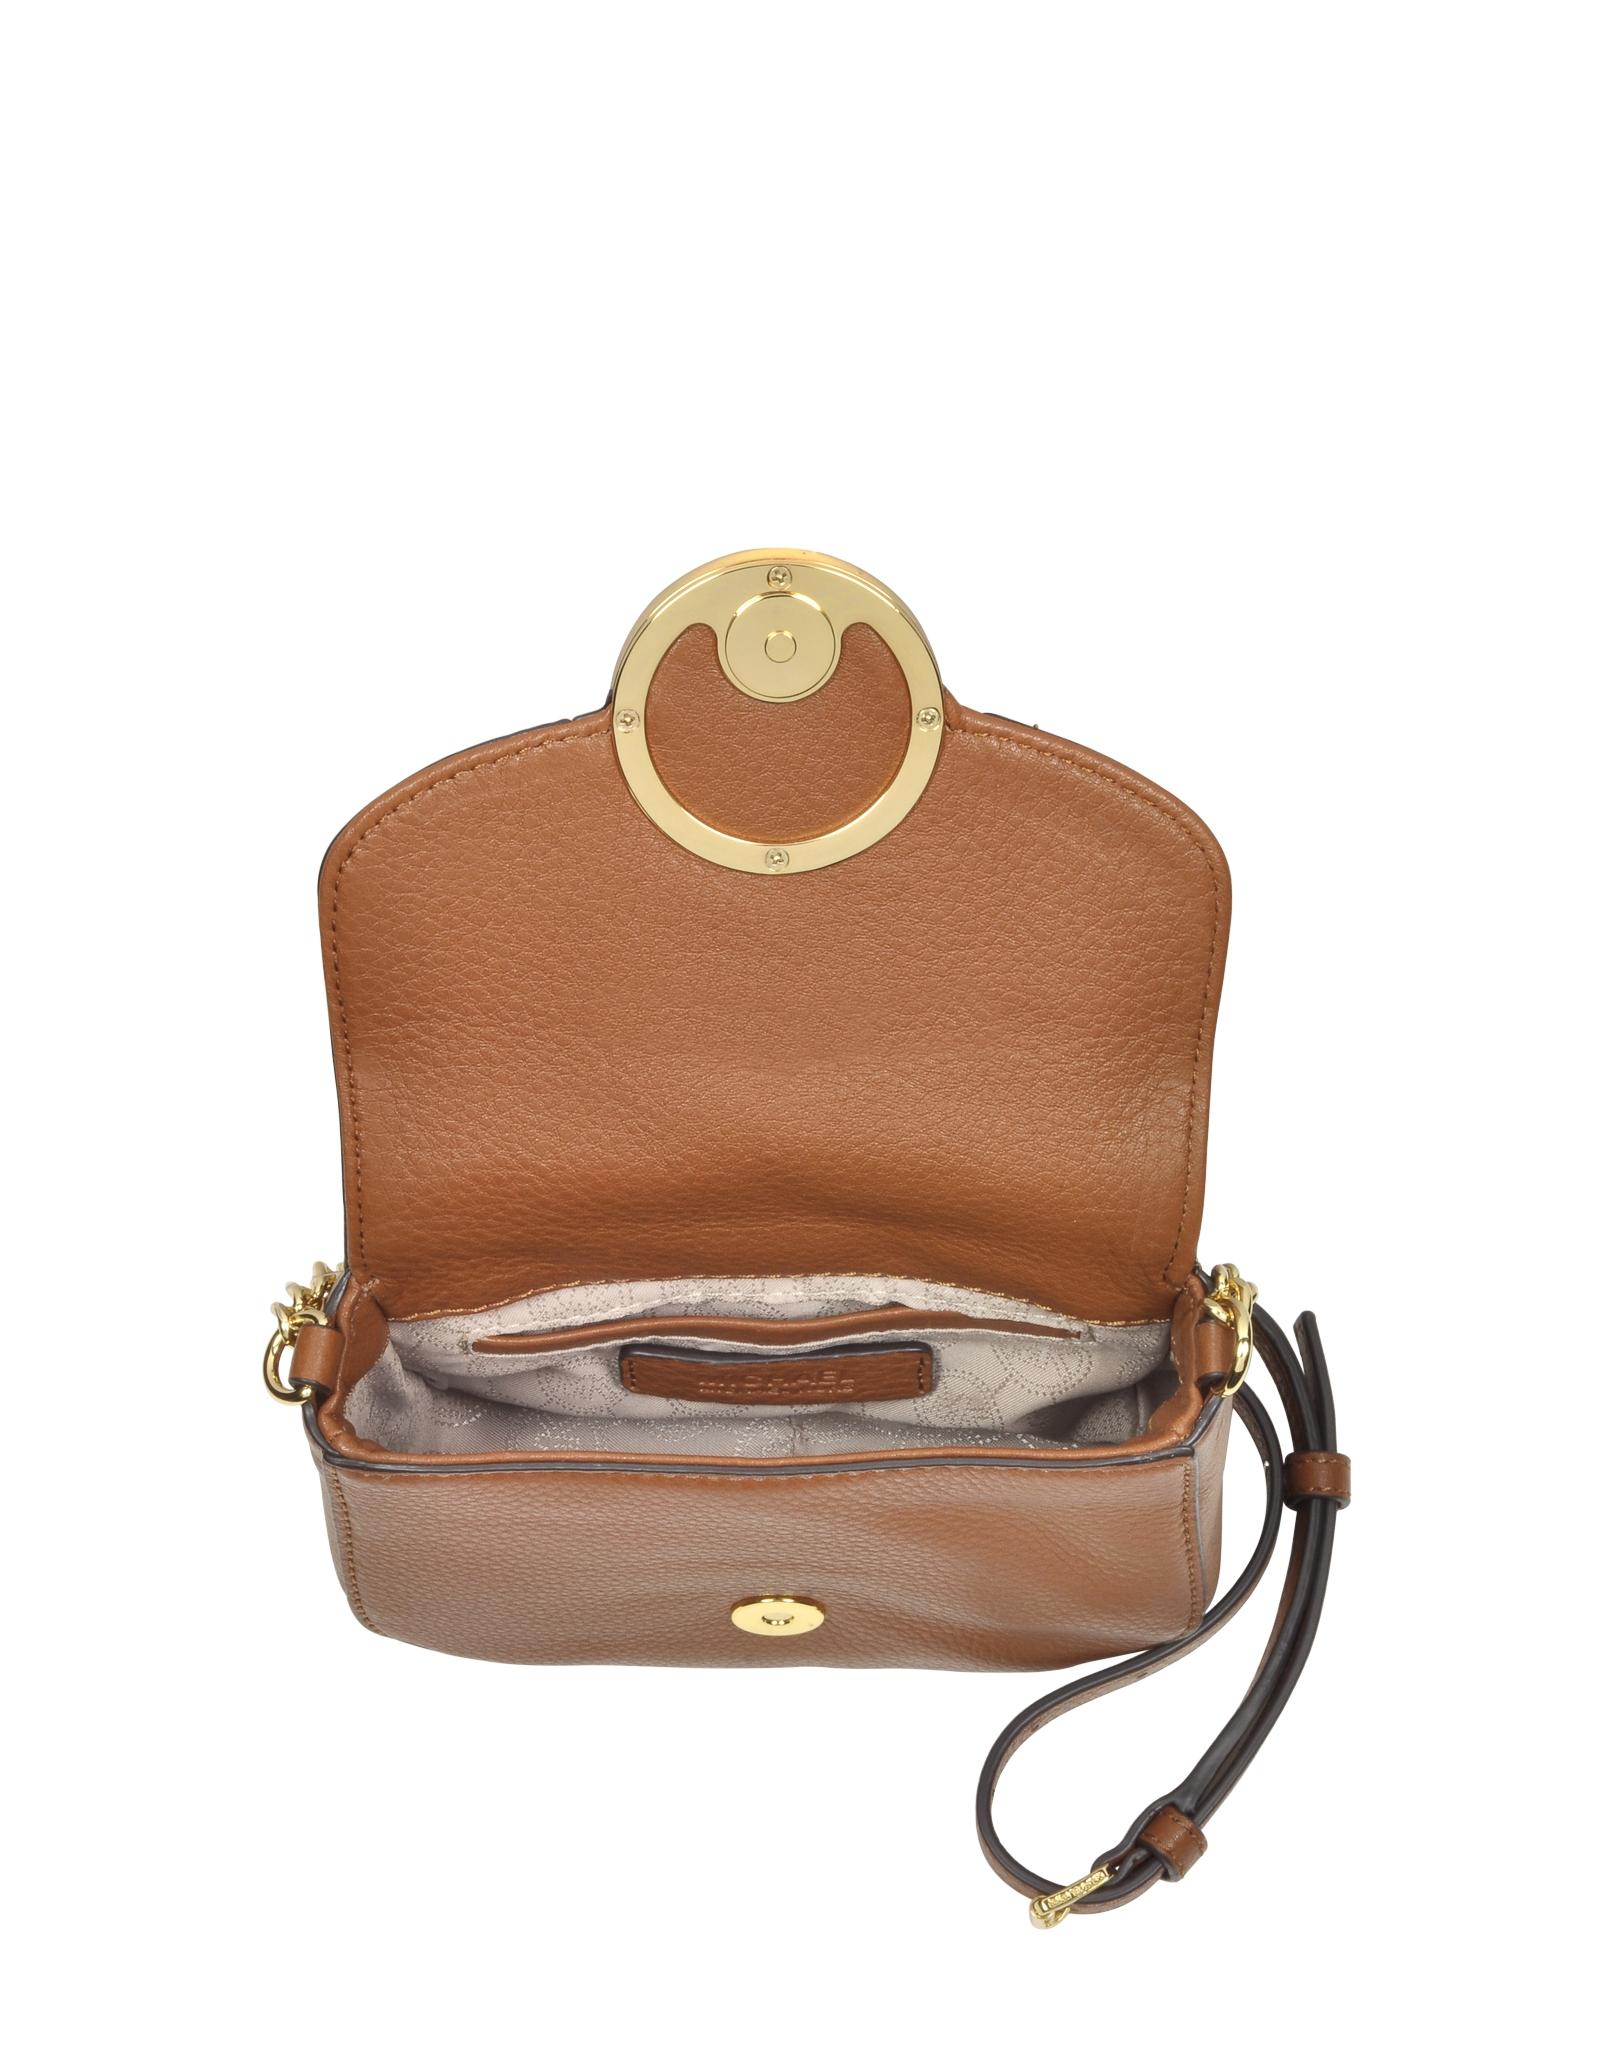 5feb1480983e Michael Kors Fulton Luggage Leather Small Crossbody Bag in Metallic - Lyst